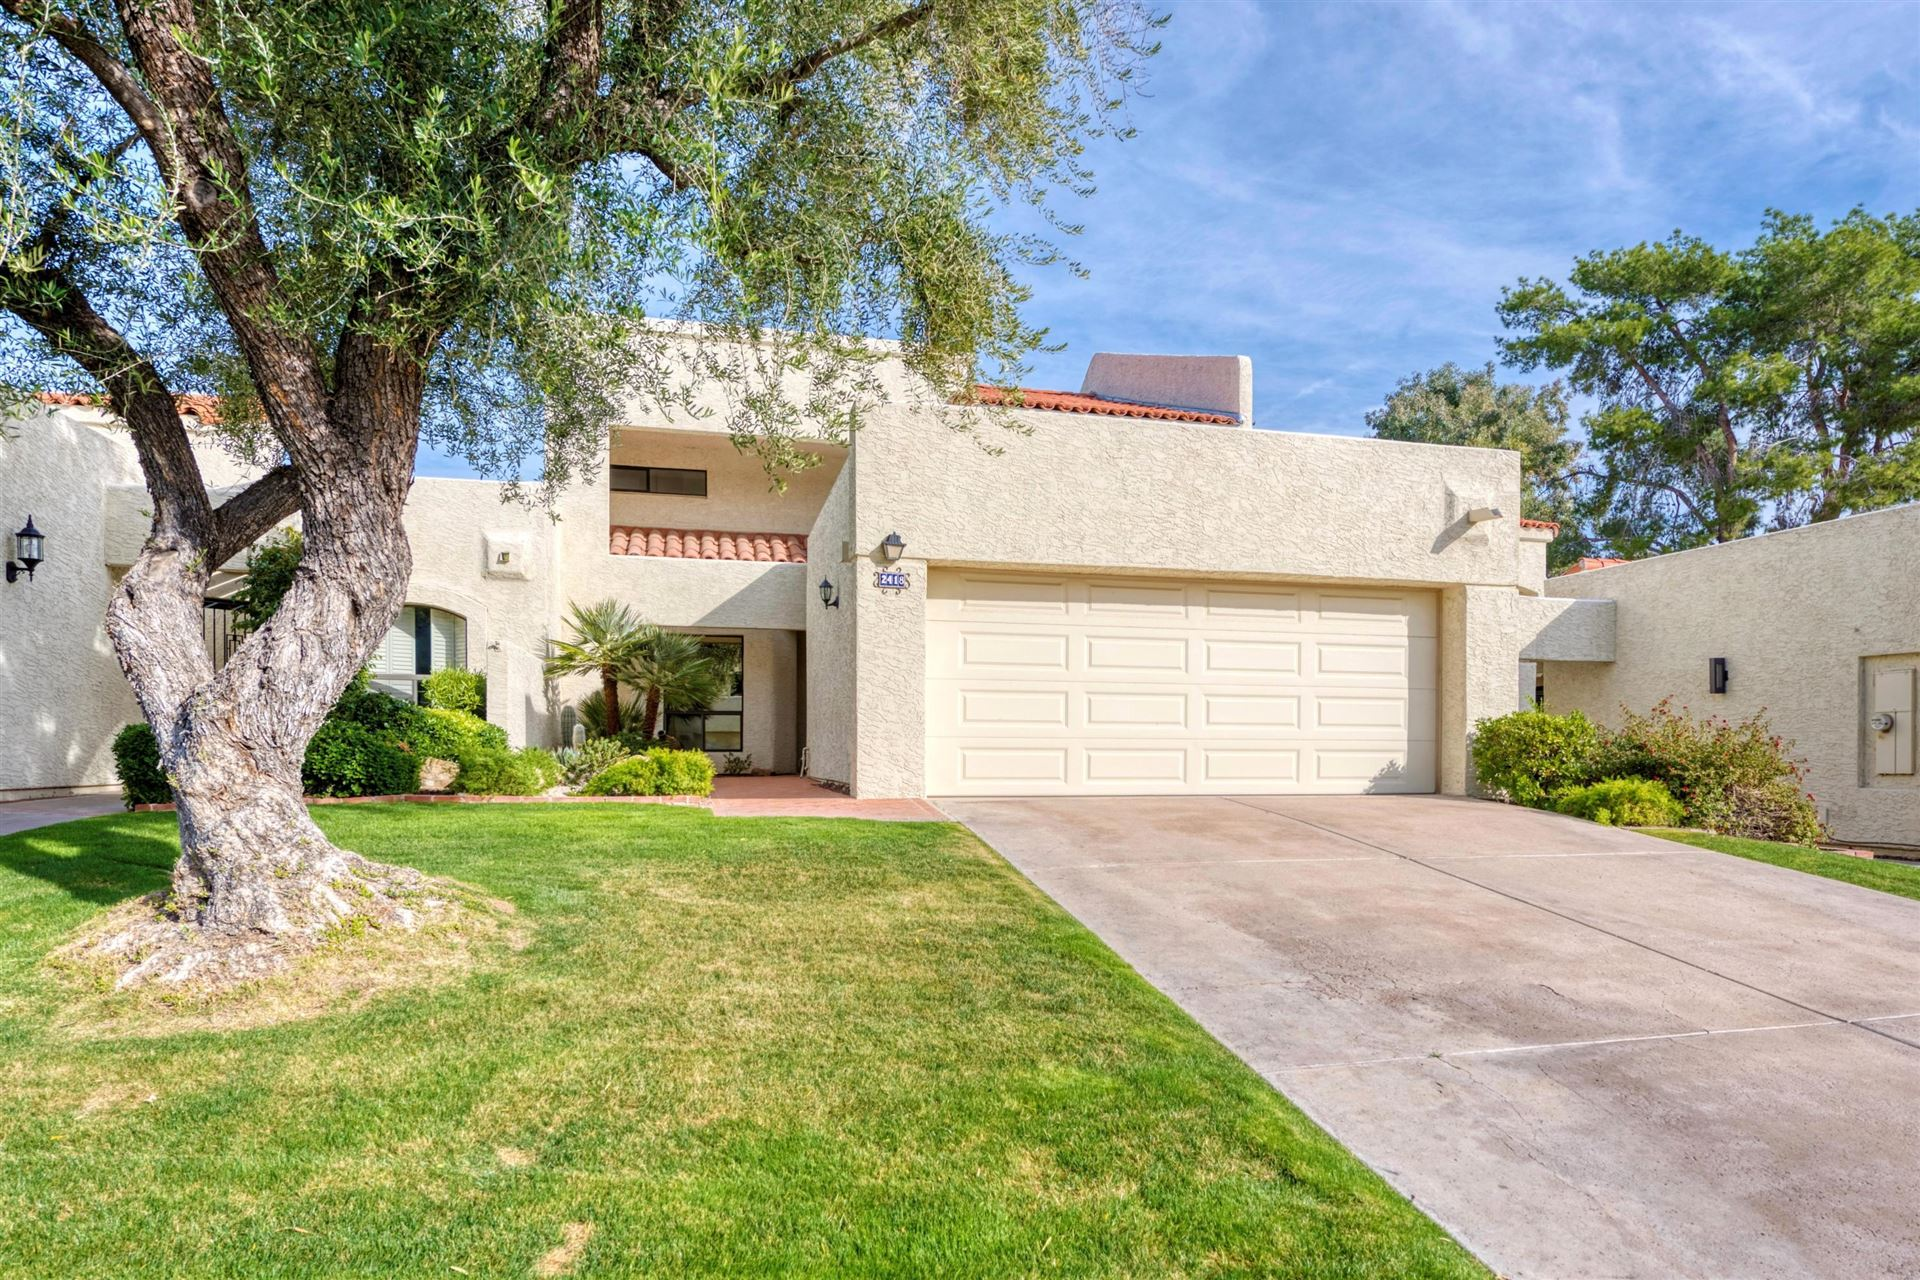 2418 E RANCHO Drive, Phoenix, AZ 85016 - MLS#: 6230578